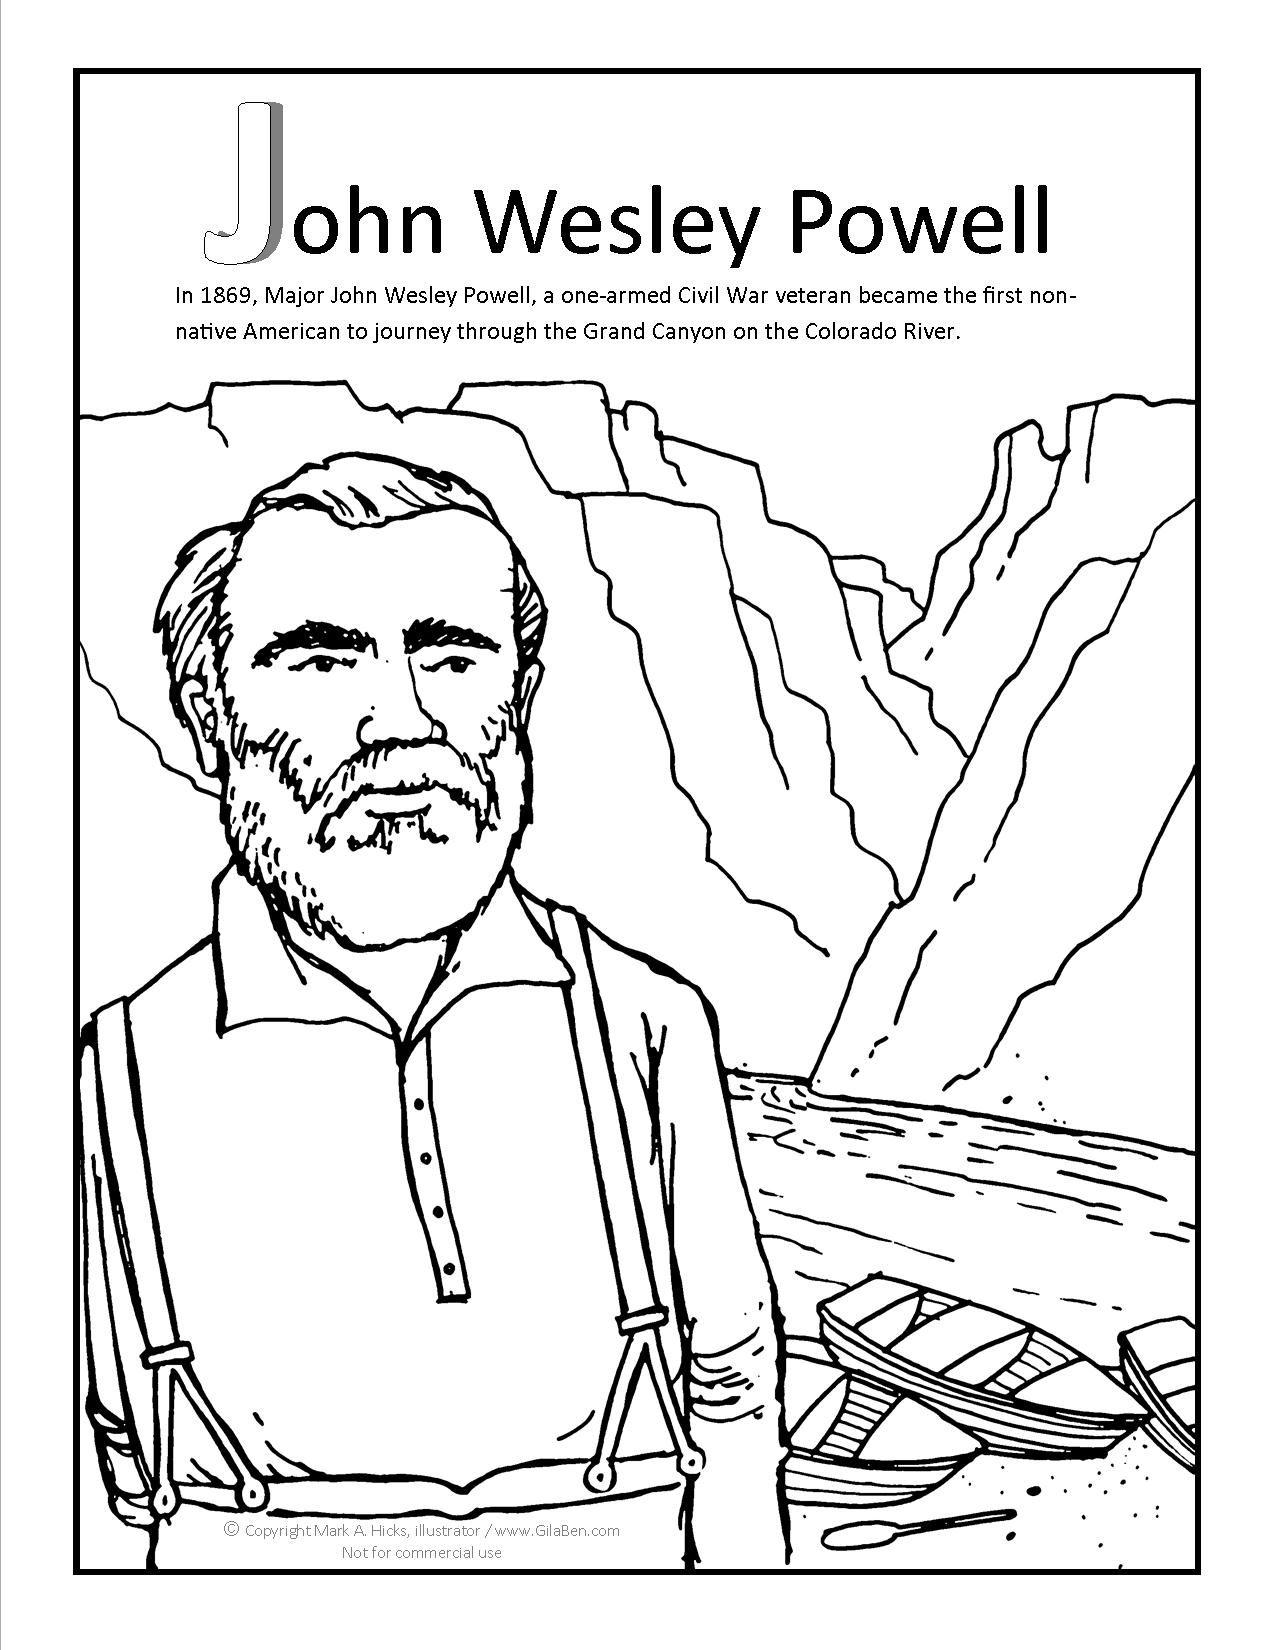 John Wesley Powell Coloring Page At Gilaben